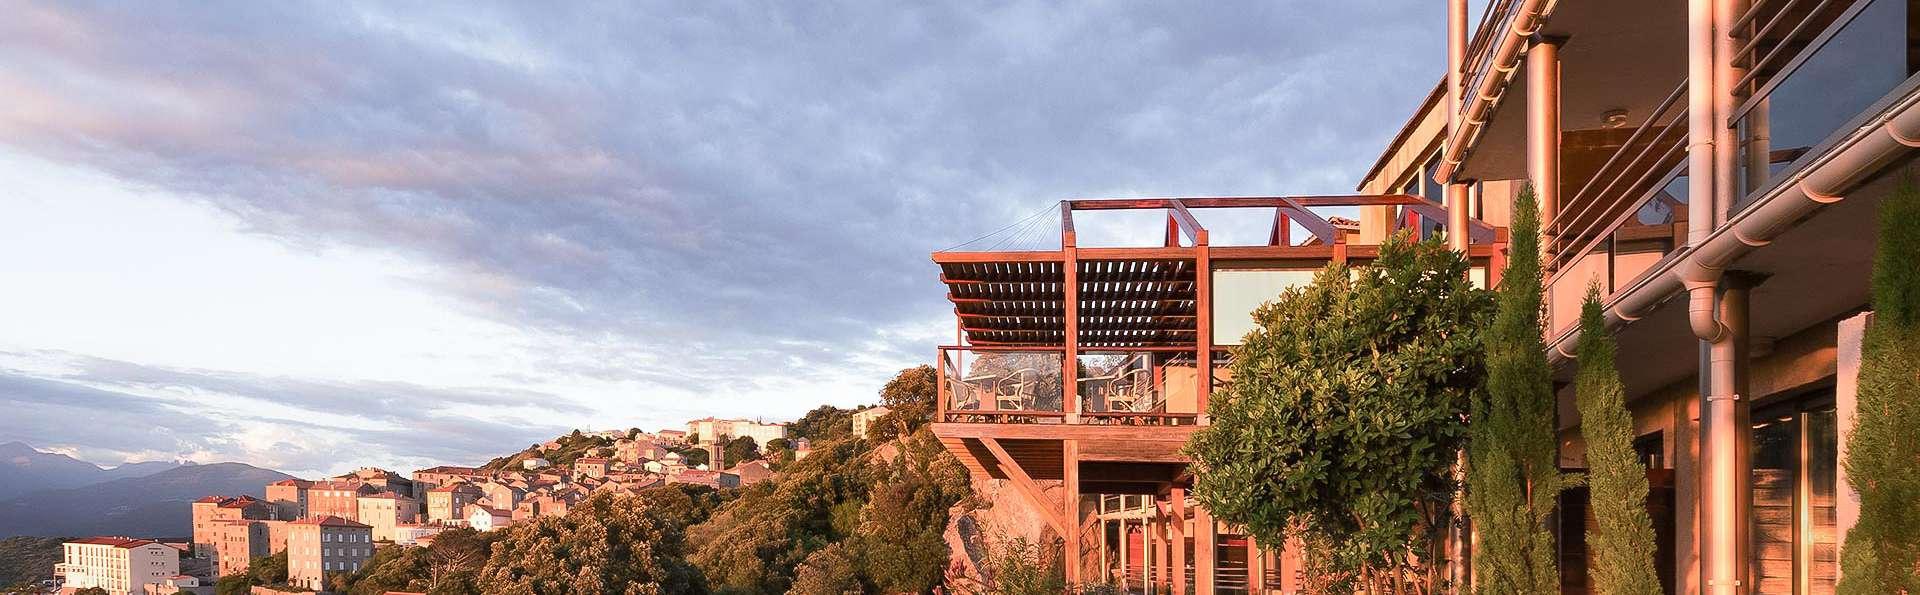 Best Western Hotel San Damianu - EDIT_FRONT_01.jpg